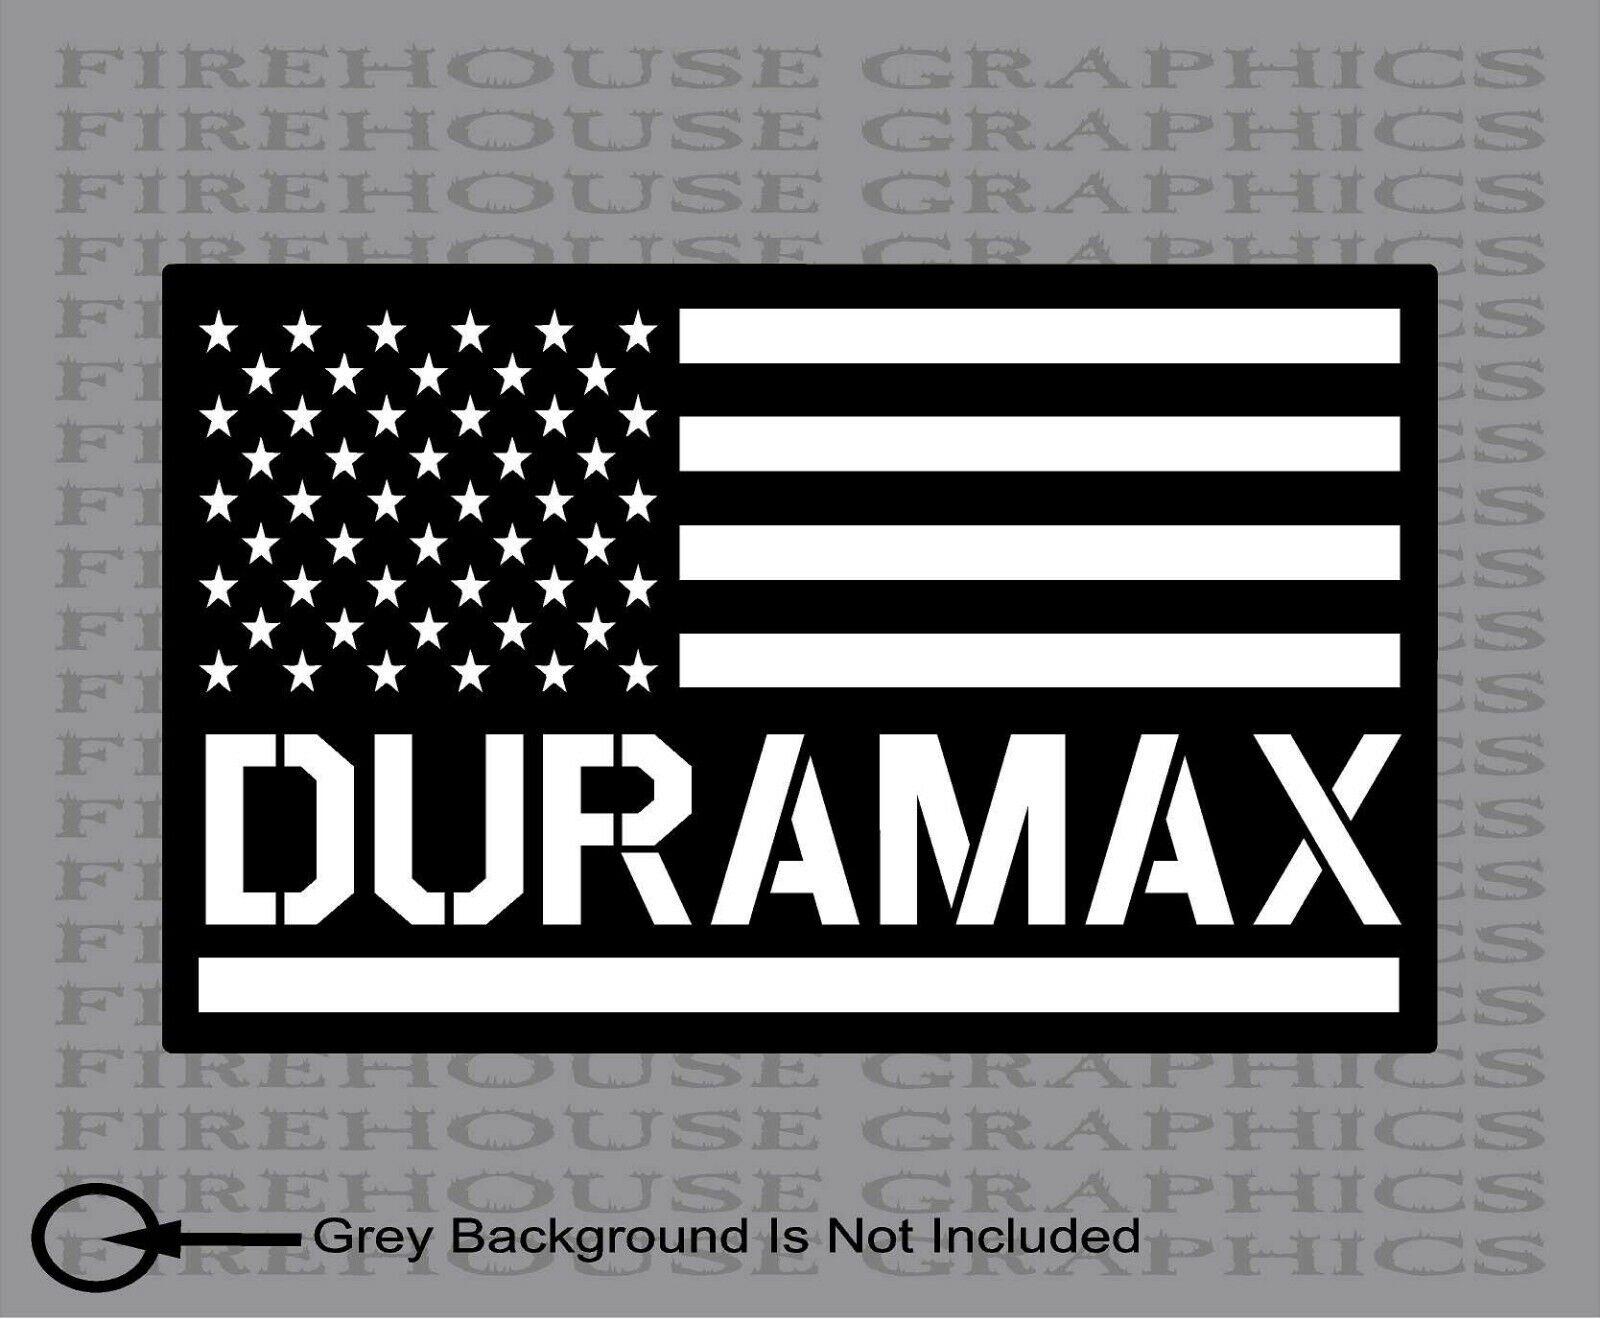 Chevy American Flag chevy American Flag UAS Dieasl Decal Sticker Truck Sticker 1